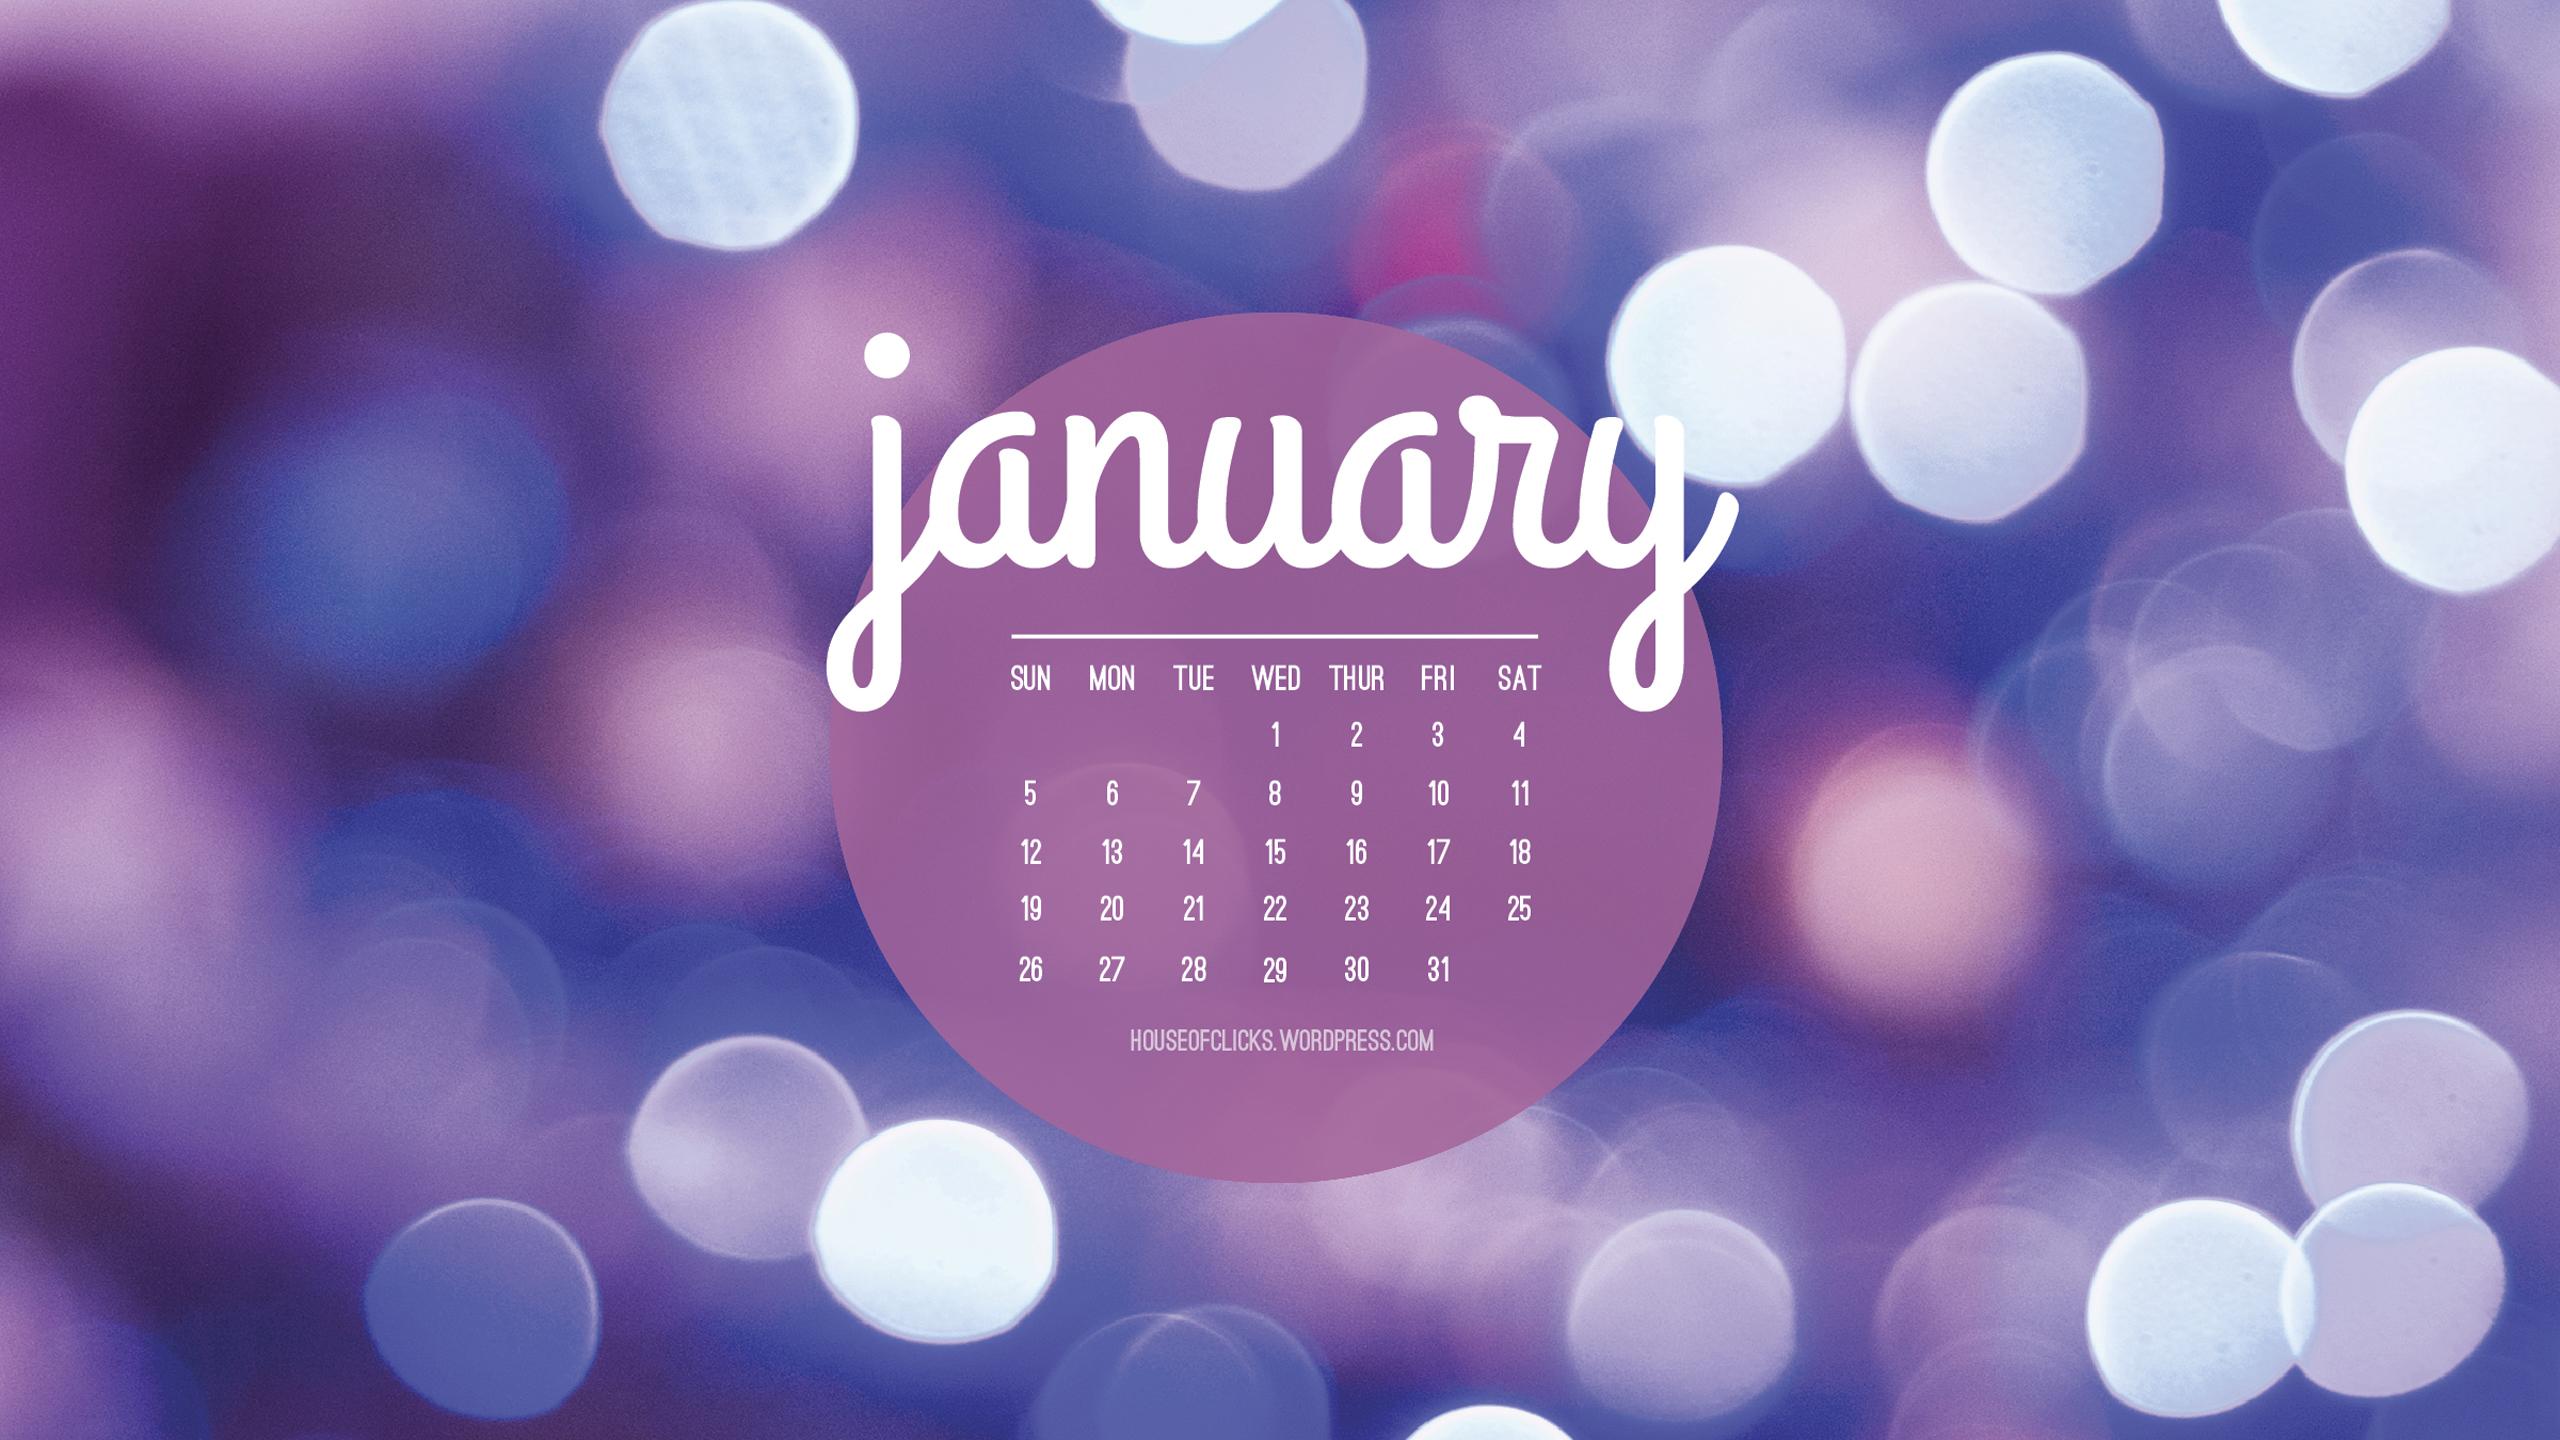 January 2014 Desktop Calendar House of Clicks 2560x1440